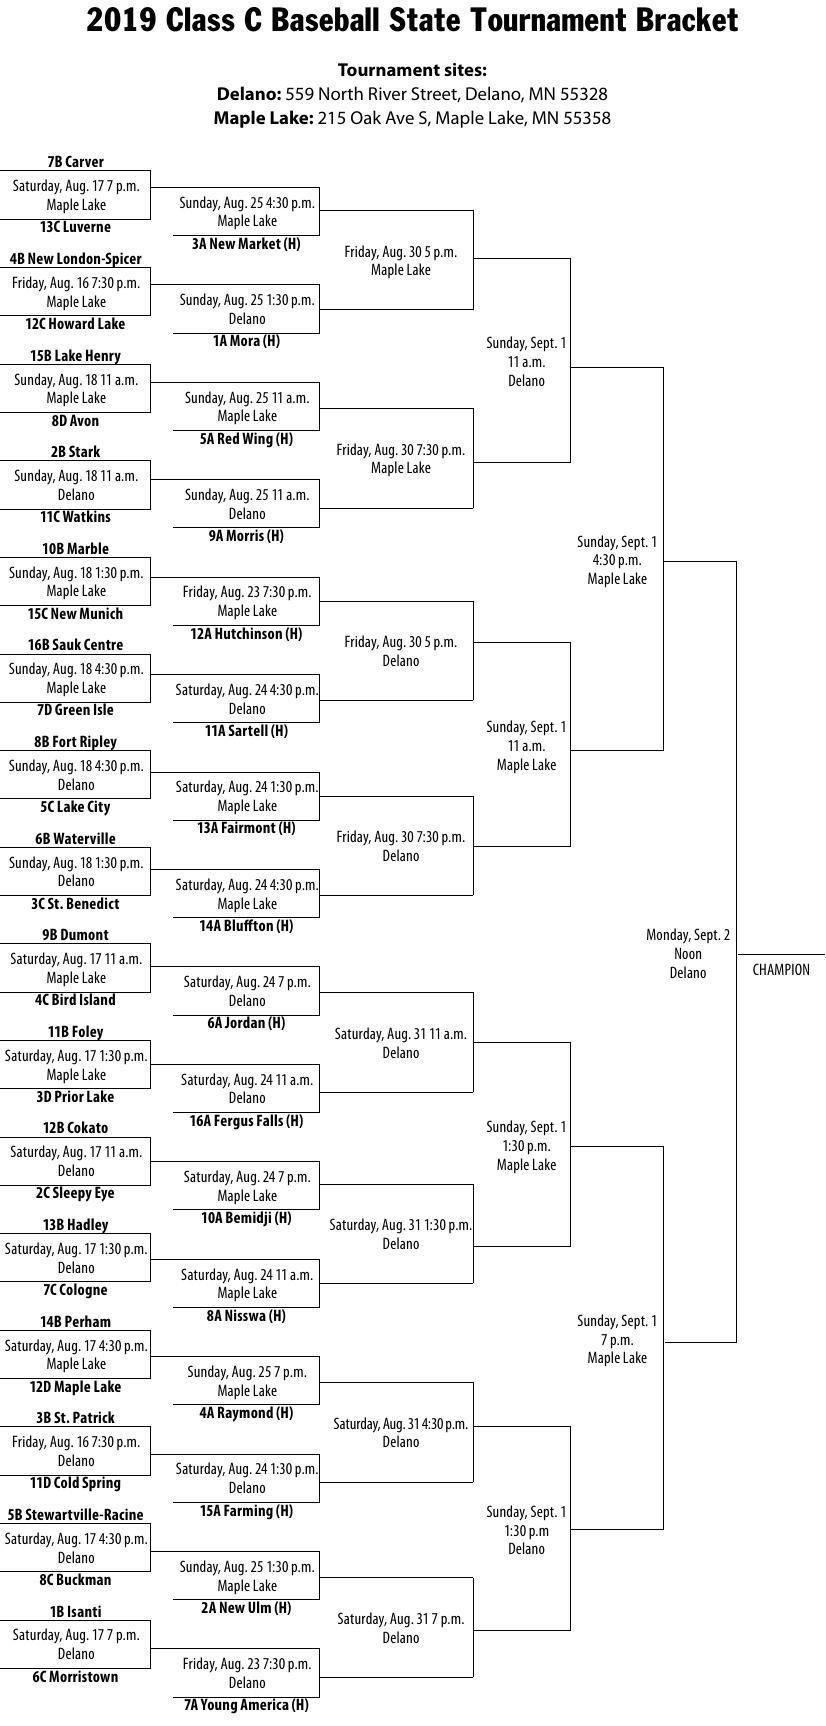 2019 Class C state tournament bracket